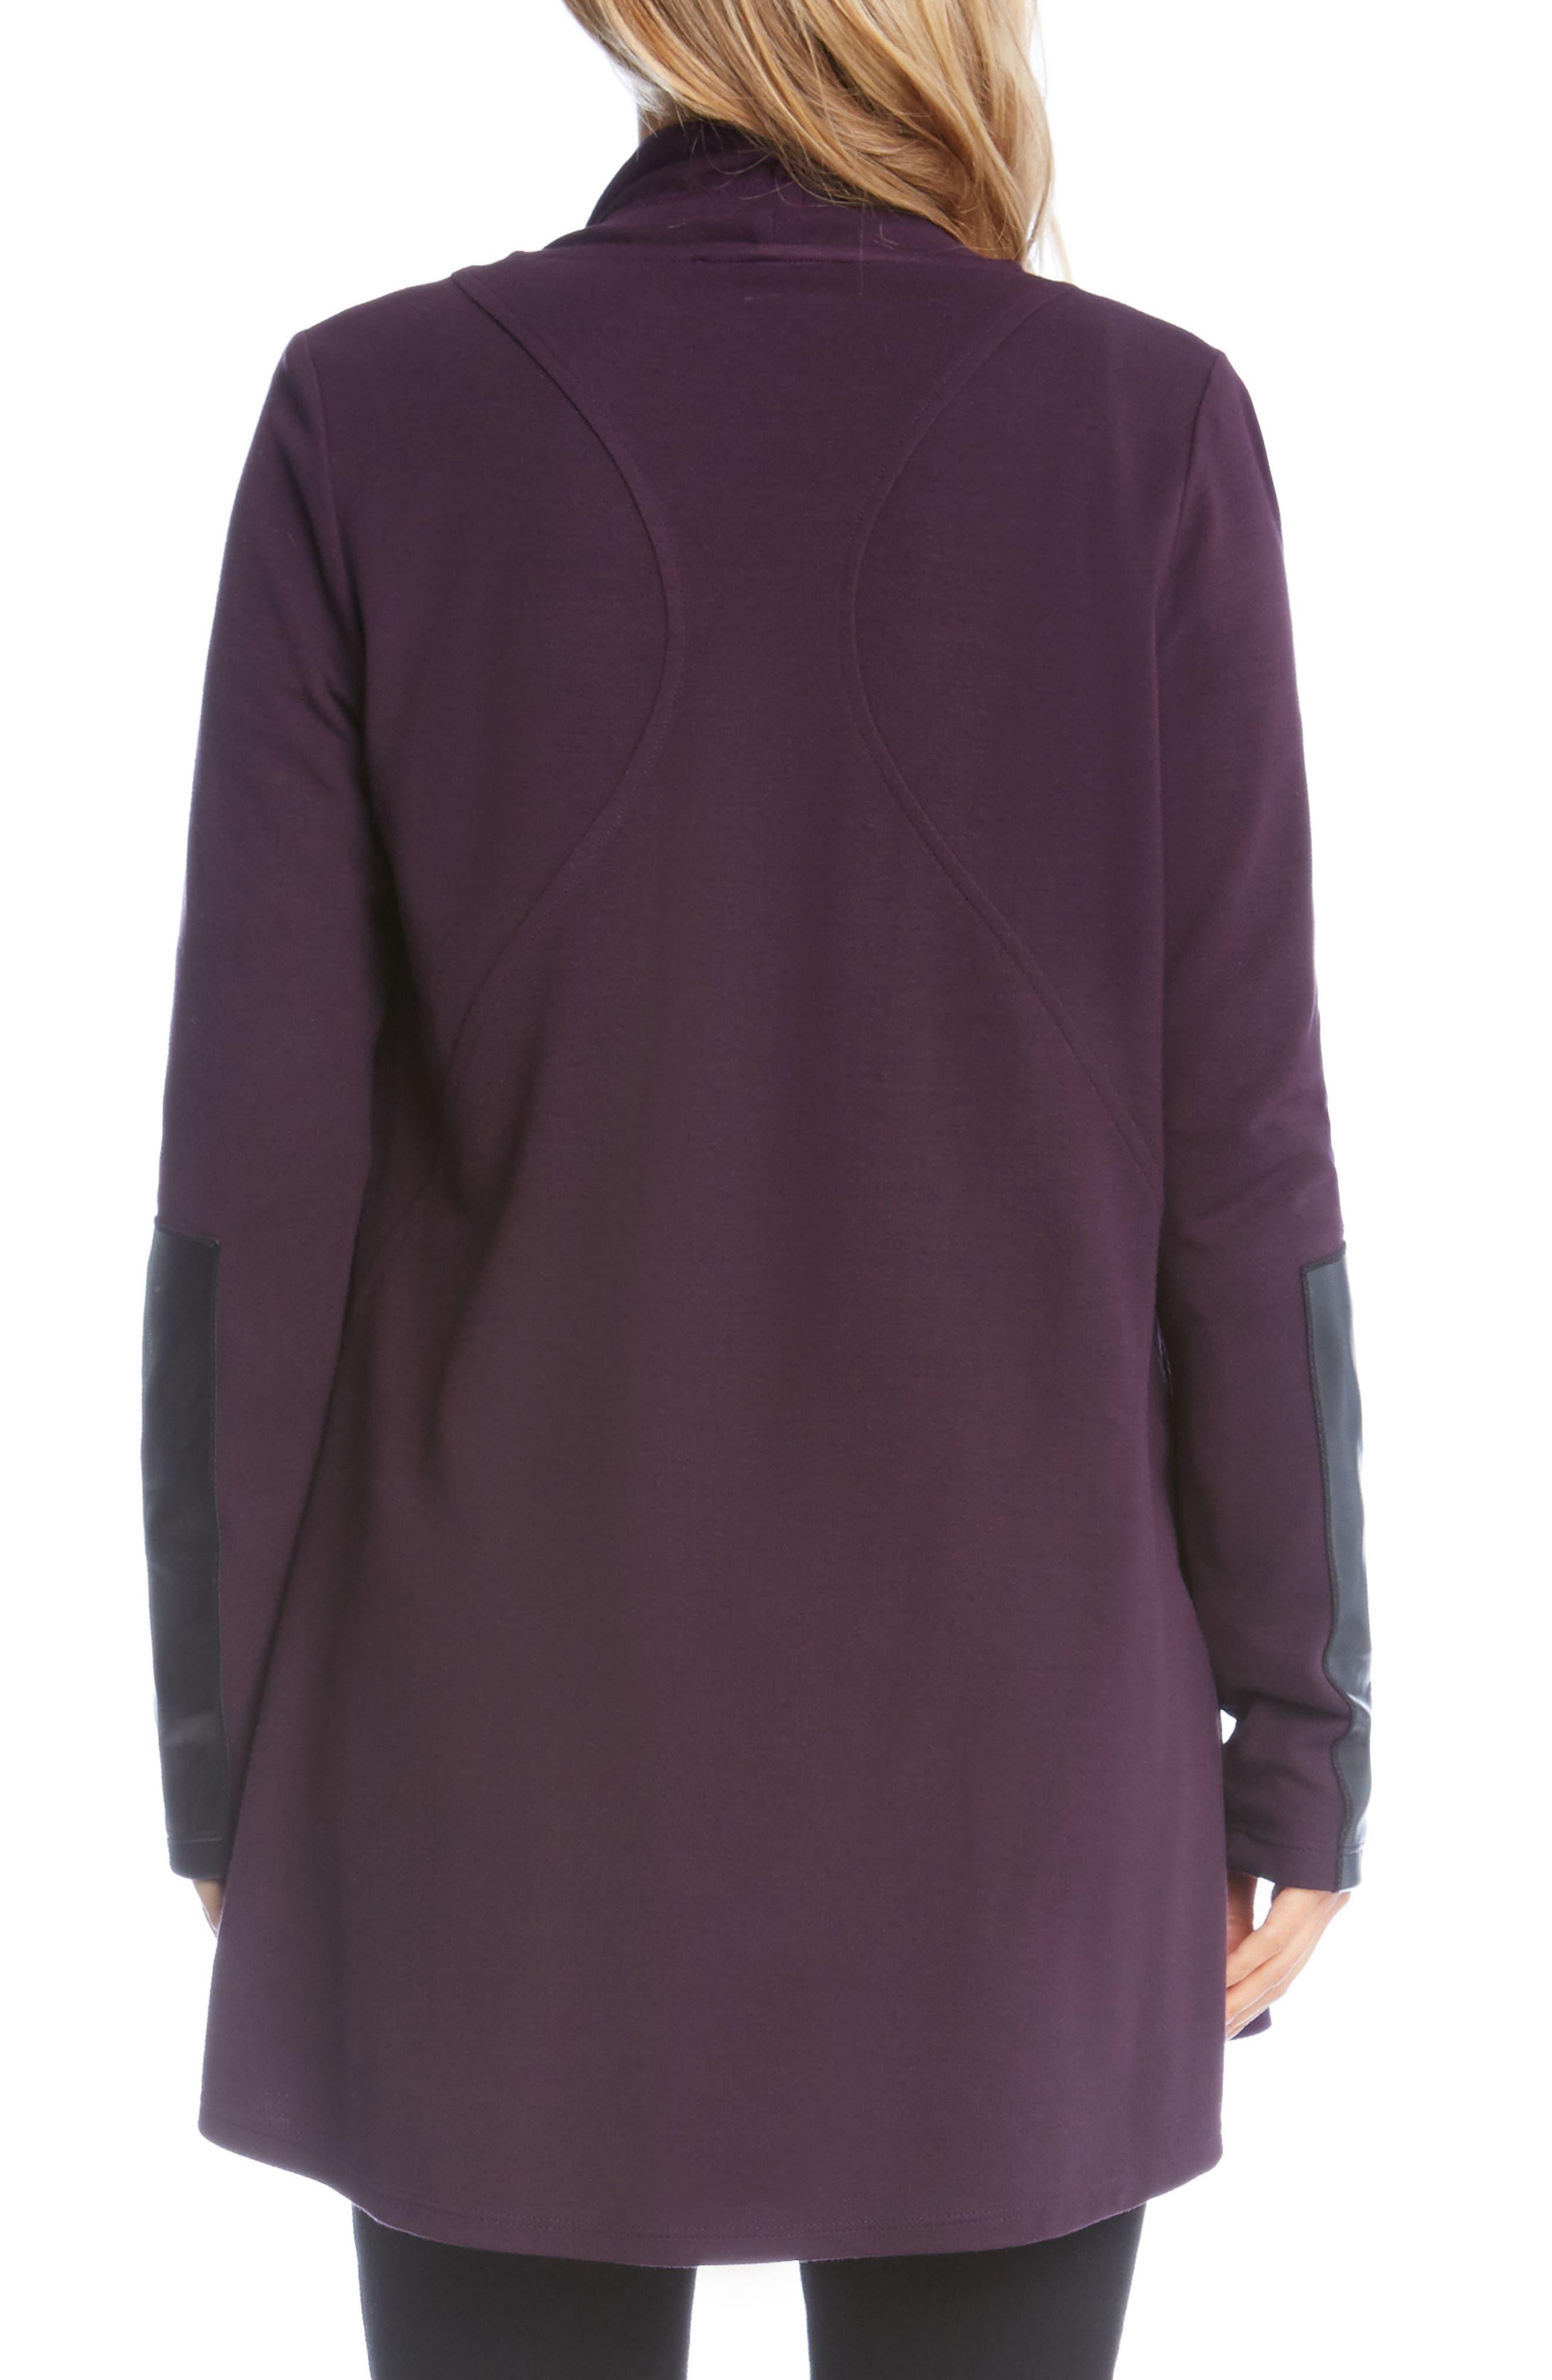 Alternate Image 2  - Karen Kane Faux Leather Patch Fleece Knit Jacket